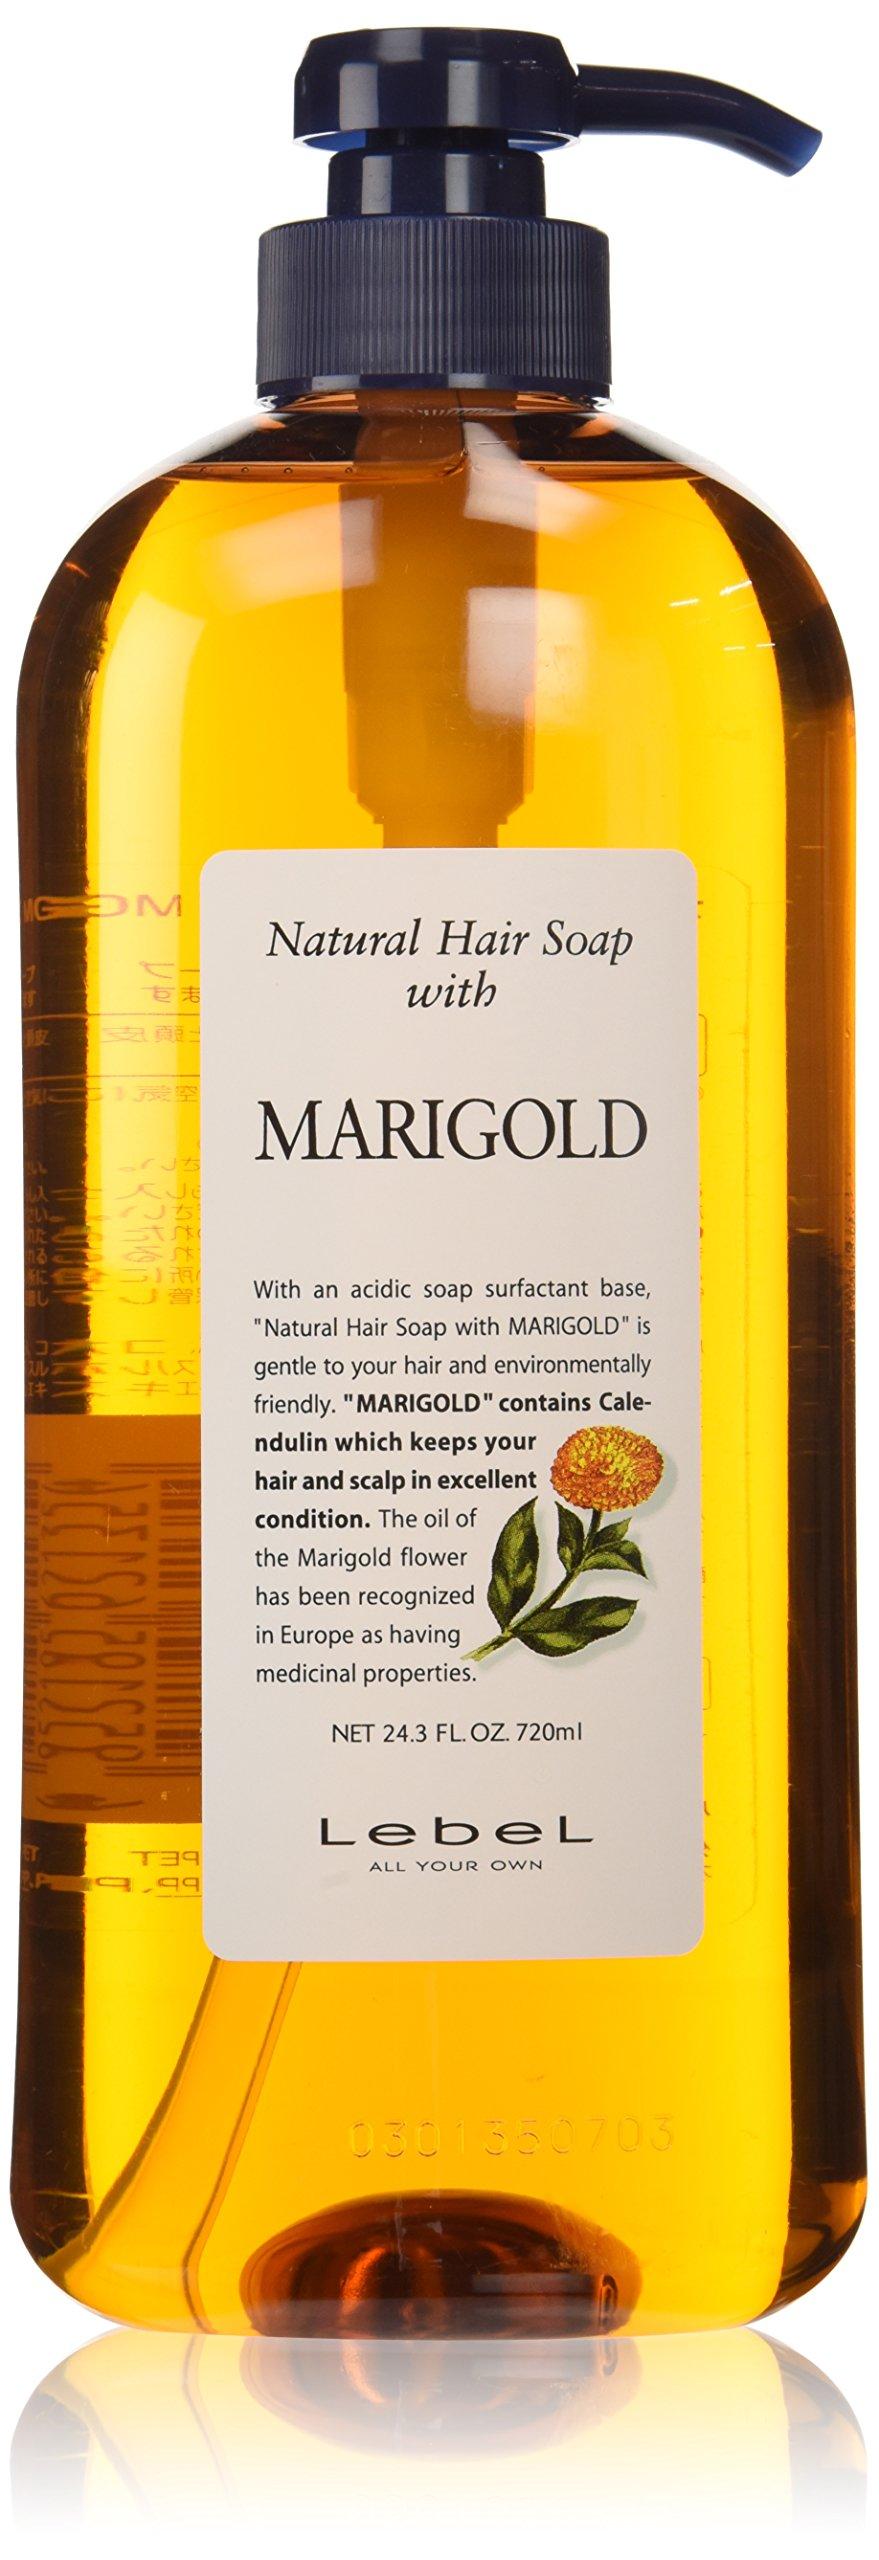 Lebel Cosmetics | Shampoo | Natural Hair Soap with Marigold Shampoo 720ml (Japan Import)